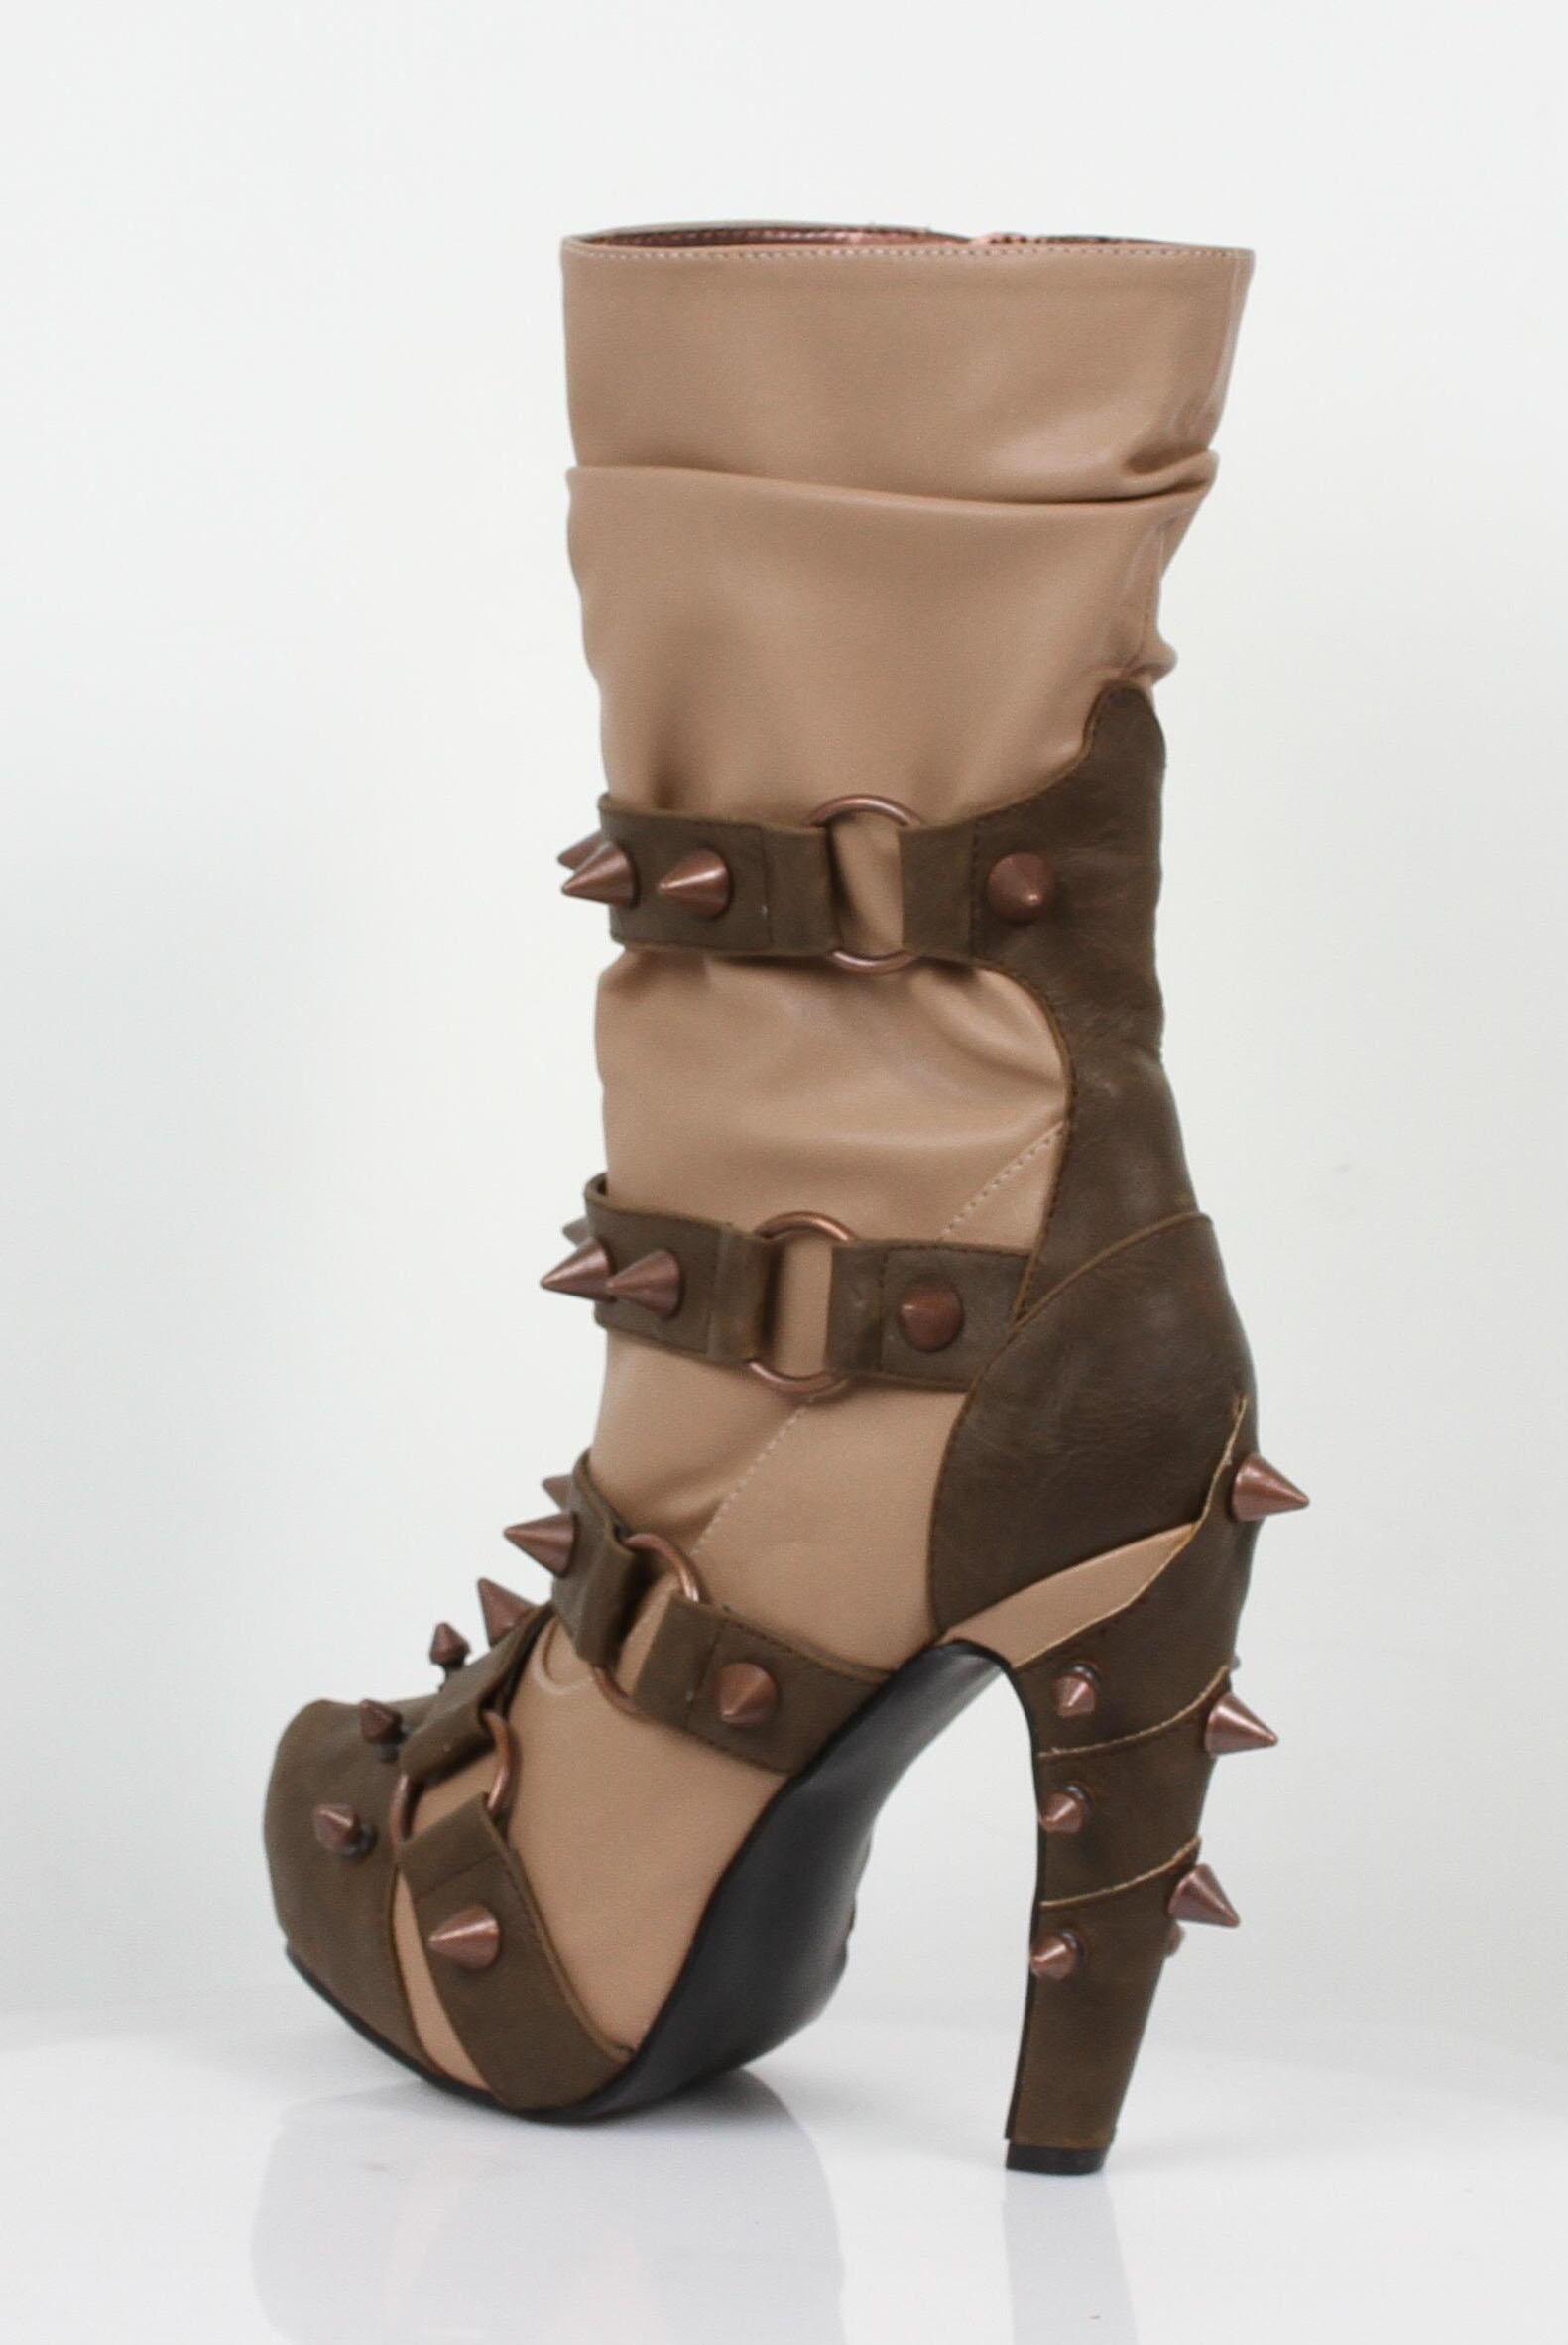 hades_shoes_bjorn_tan_steampunk_booties_boots_2.jpg